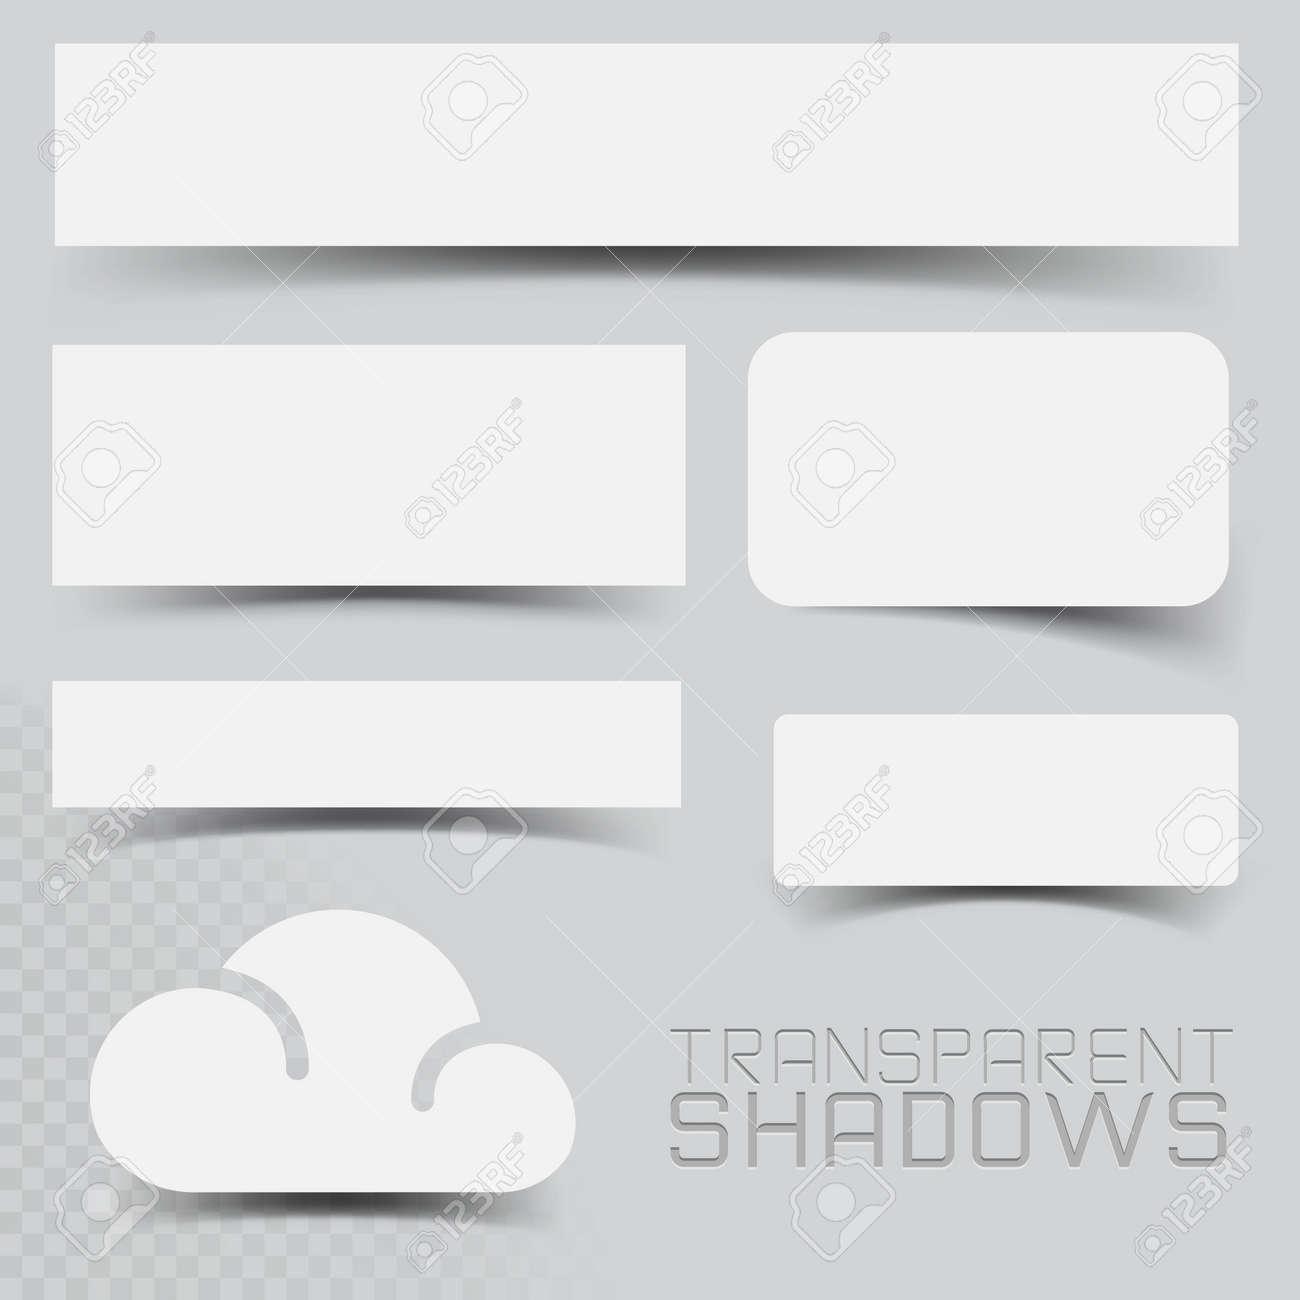 Shadow Effects - 16462388